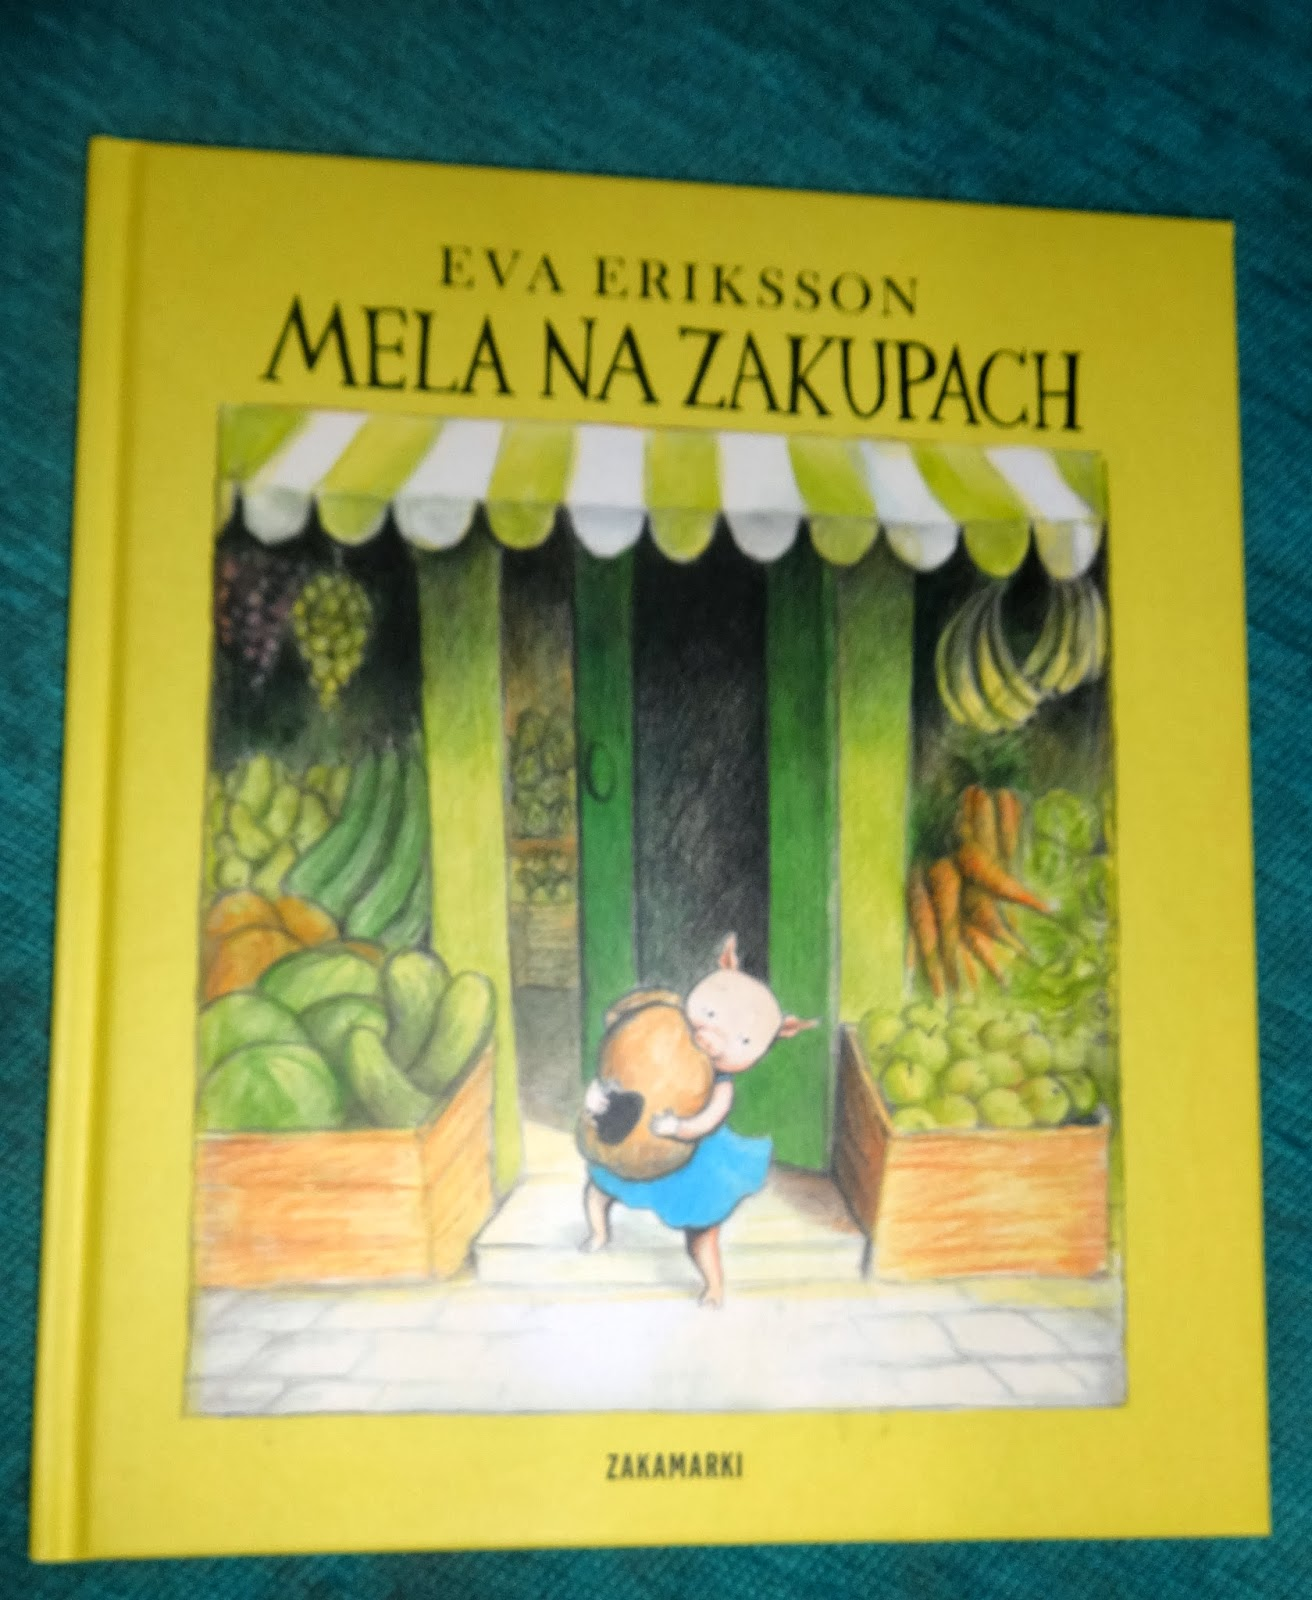 Mela na zakupach- Eva Eriksson